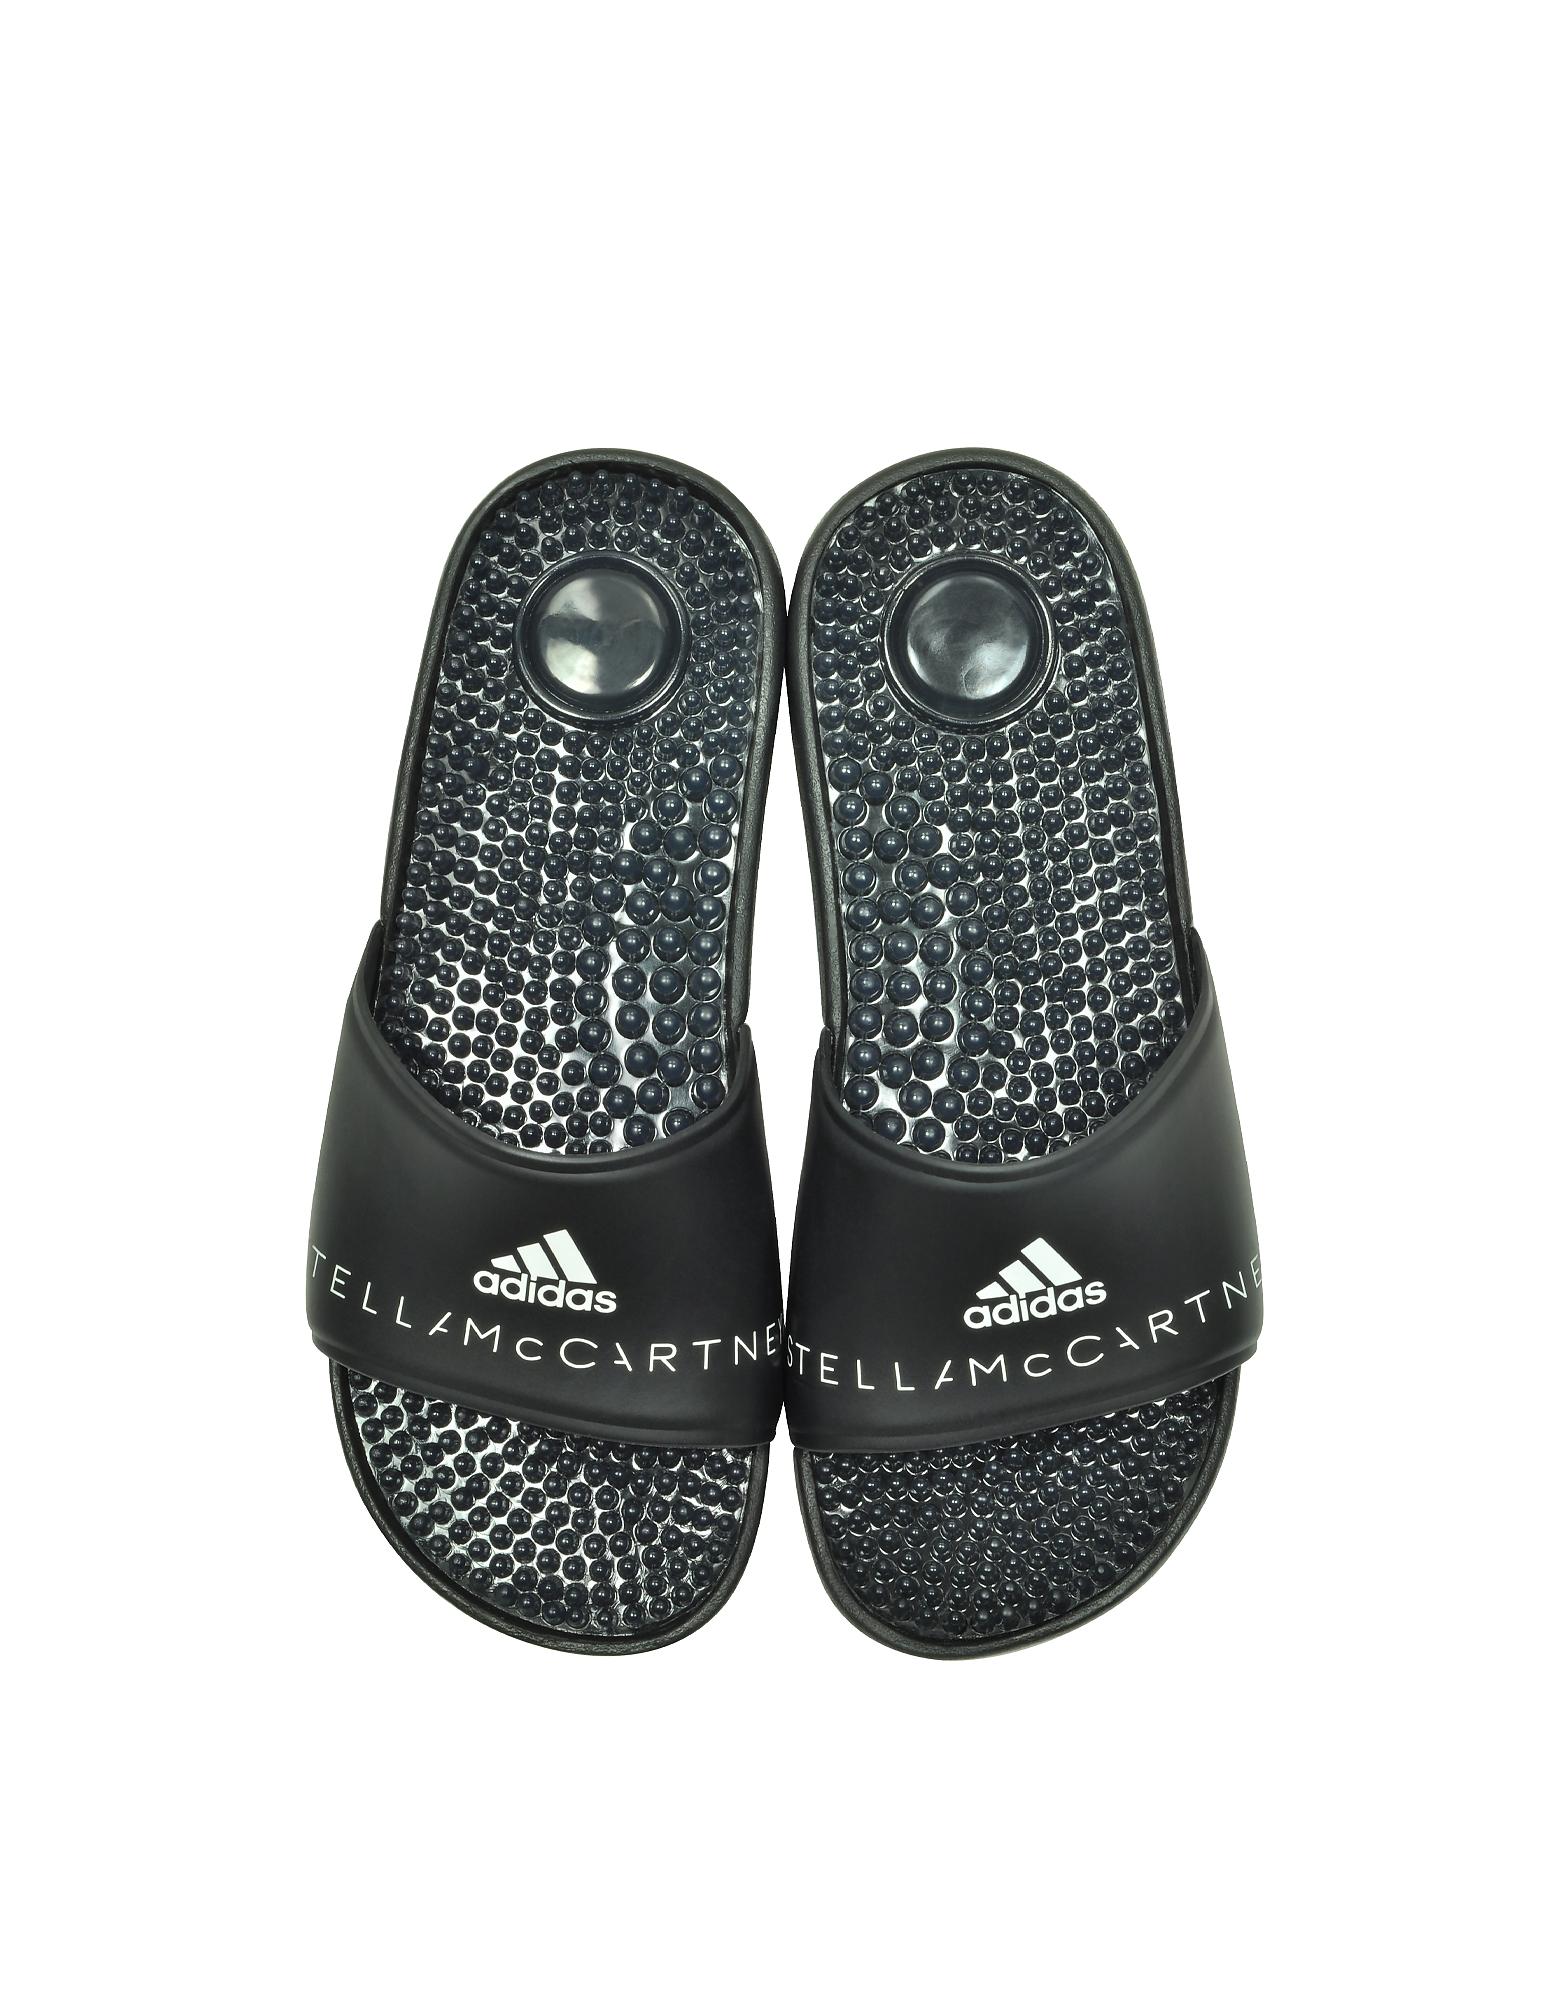 Adidas Stella McCartney Shoes, Adissage Black Slide Pool Sandals